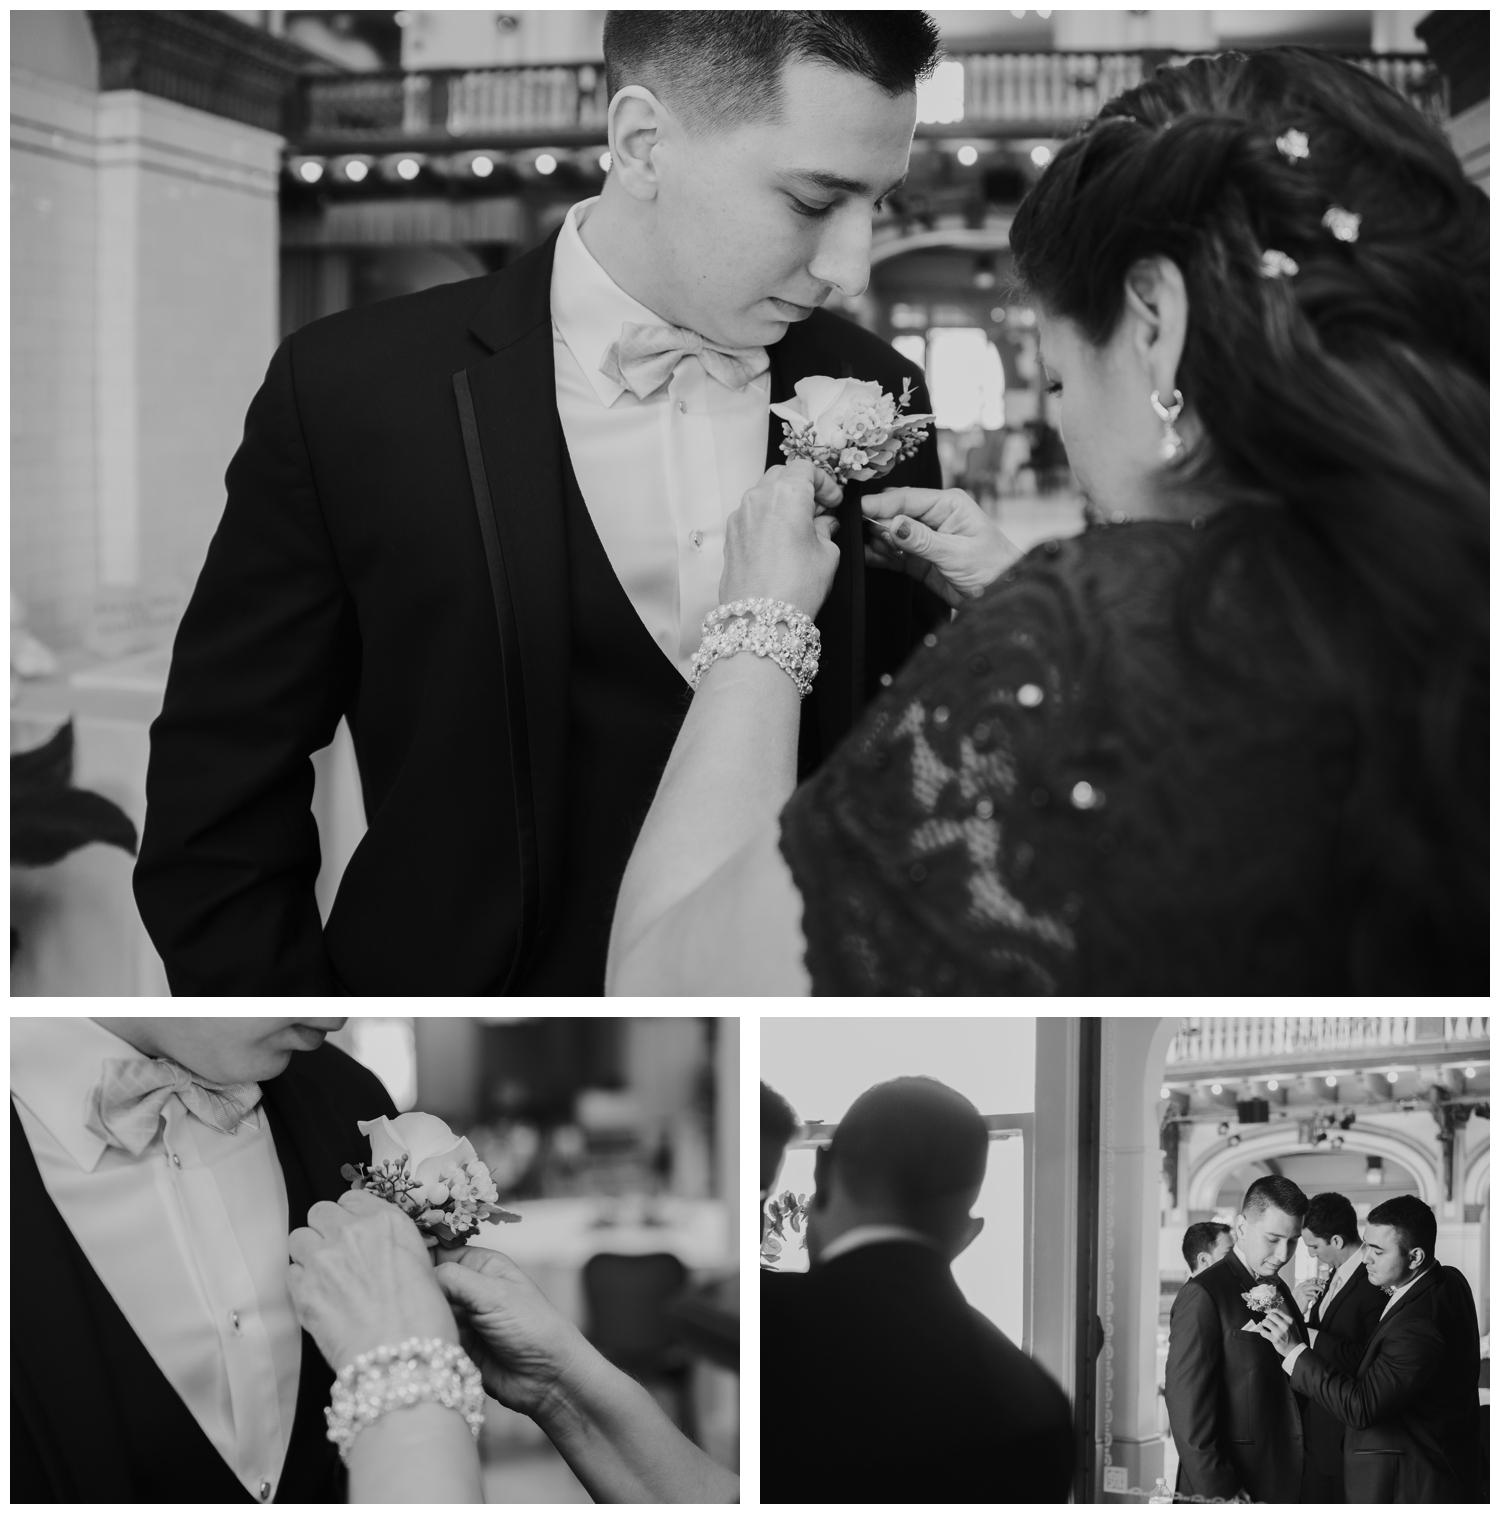 Jenna+Brandon, Mission Concepcion Wedding, San Antonio, Contista Productions Wedding Photography_0164.jpg